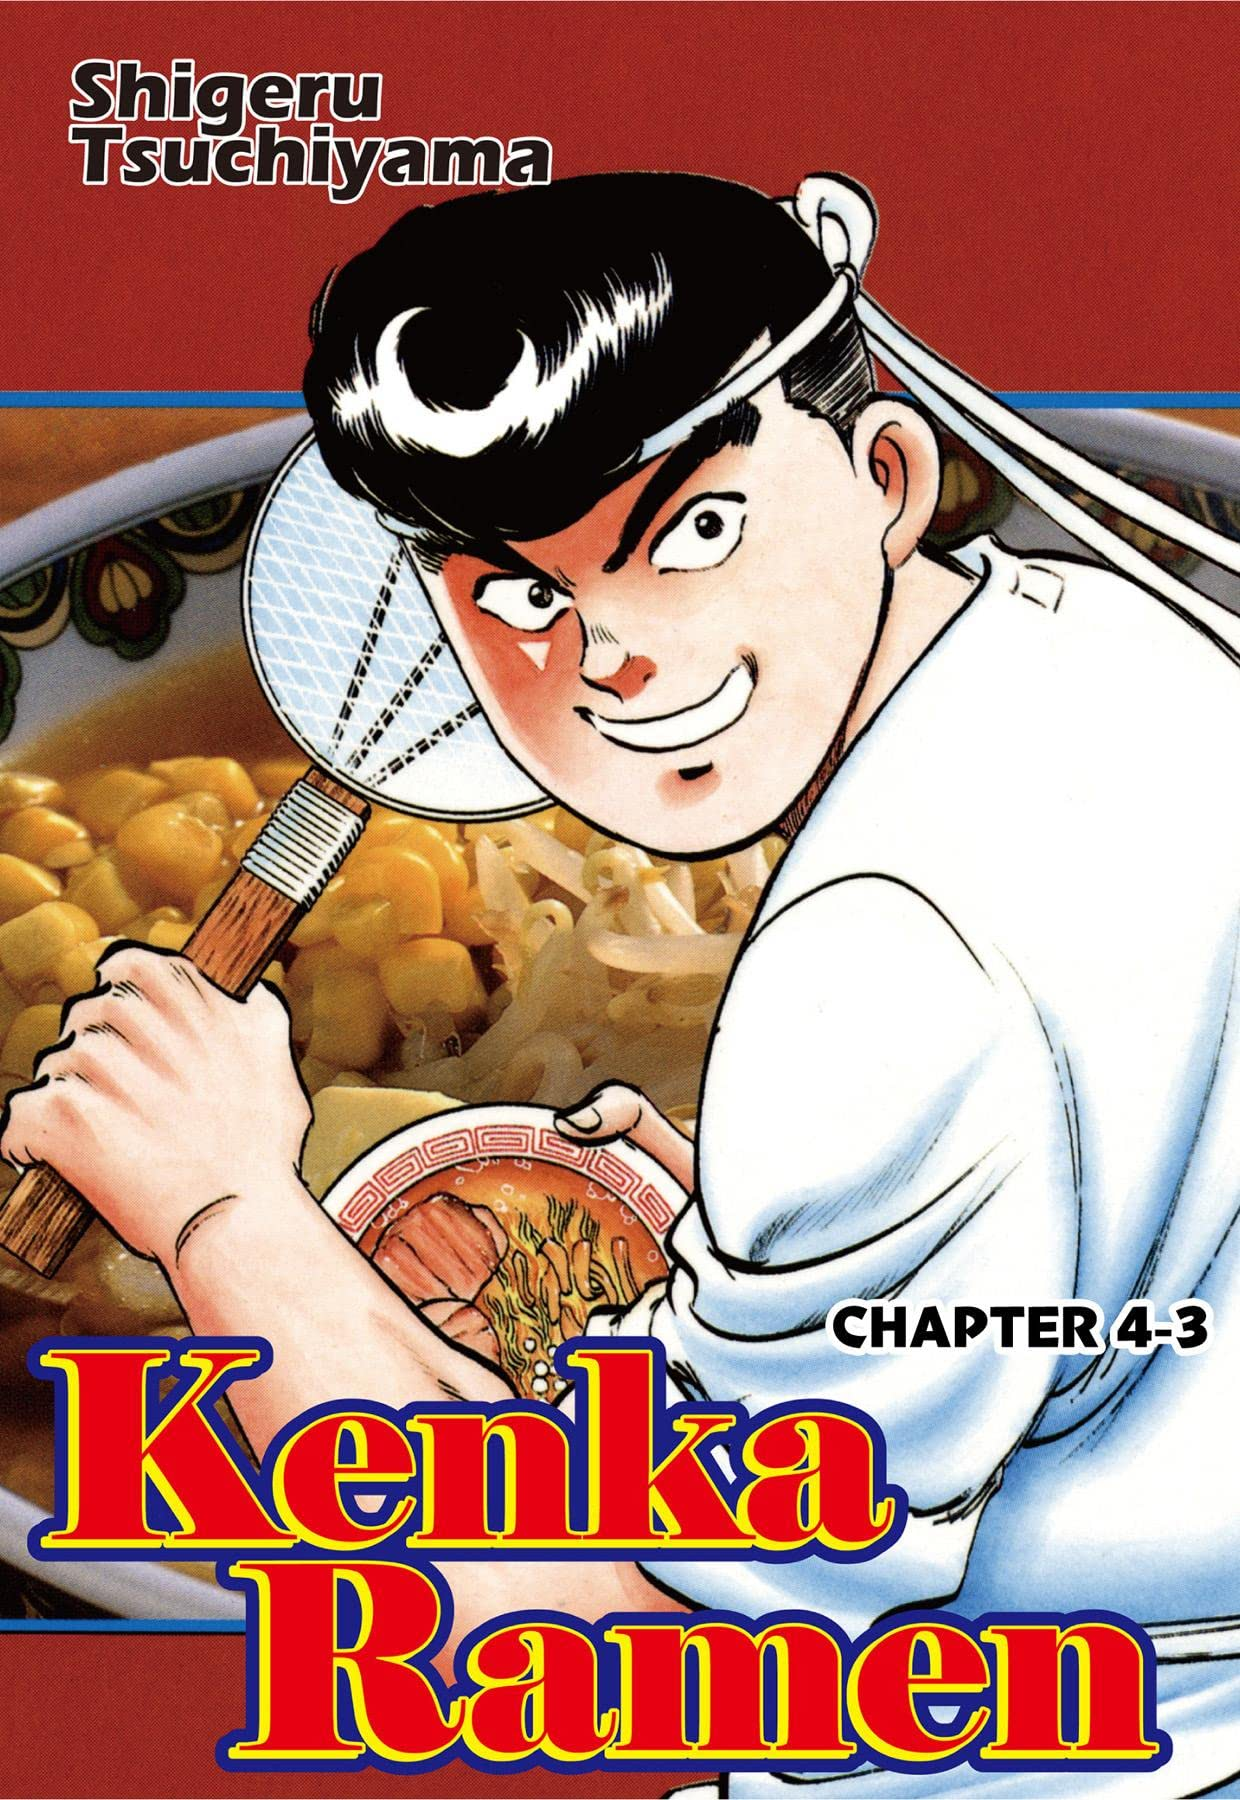 KENKA RAMEN #30